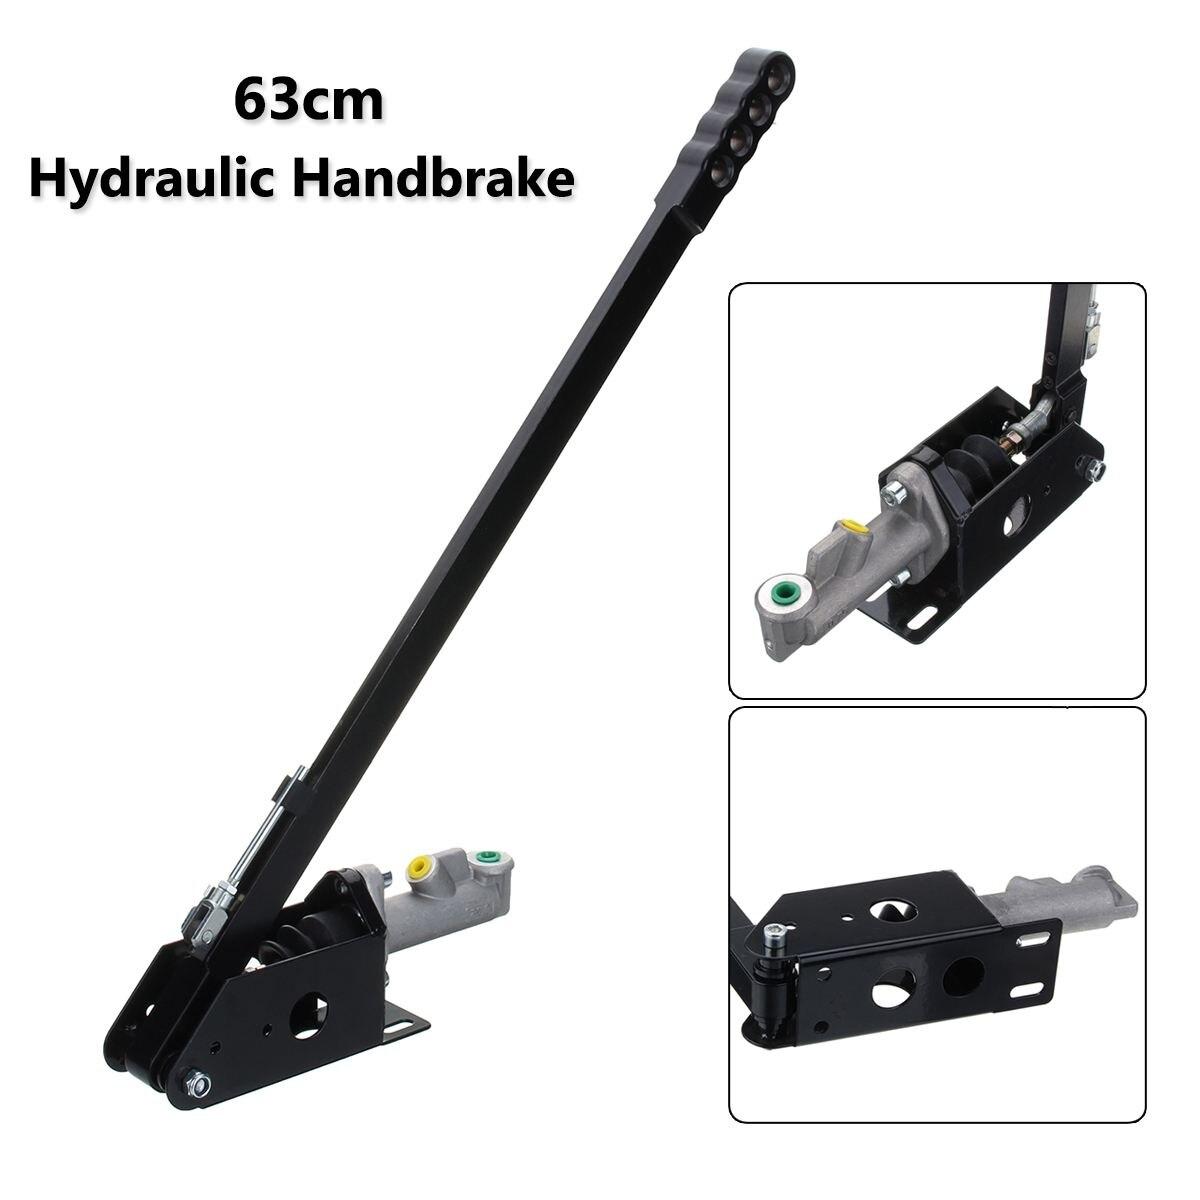 63cm Universal Long Vertical Hydraulic Handbrake Hydro E brake Drift Race Hand Brake